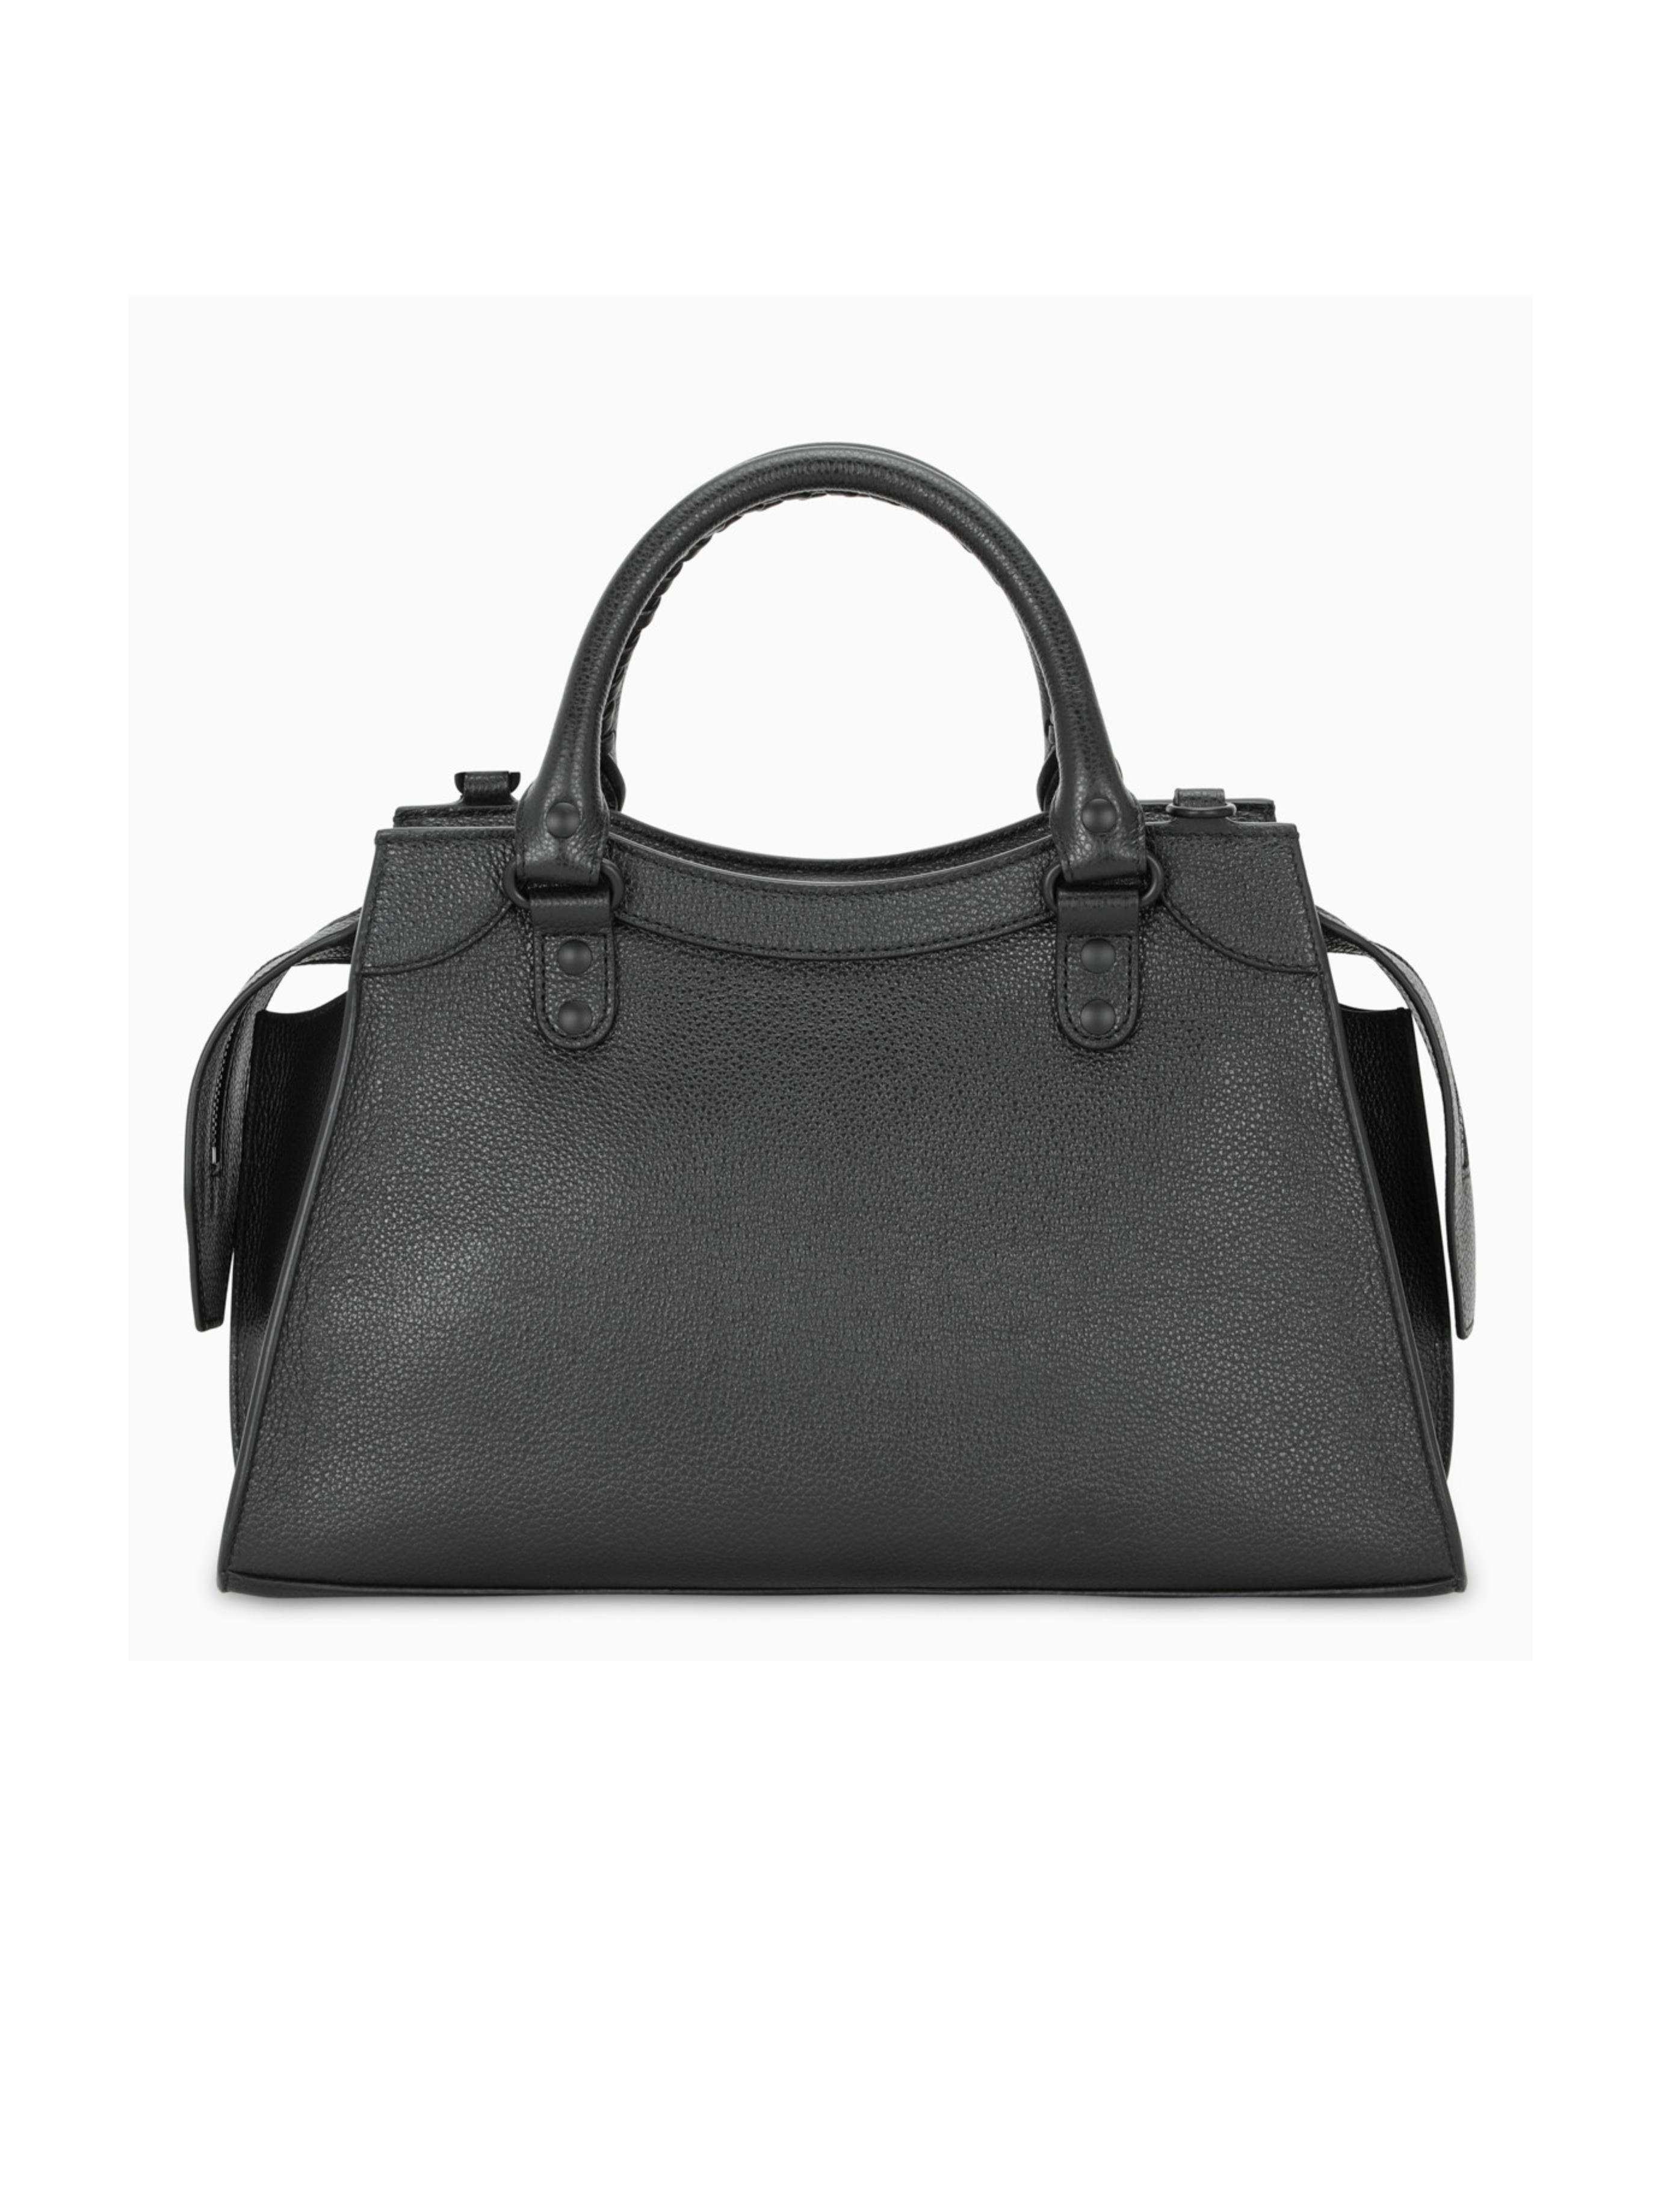 Picture of Balenciaga | Neo Classic City S Top Handle Bag